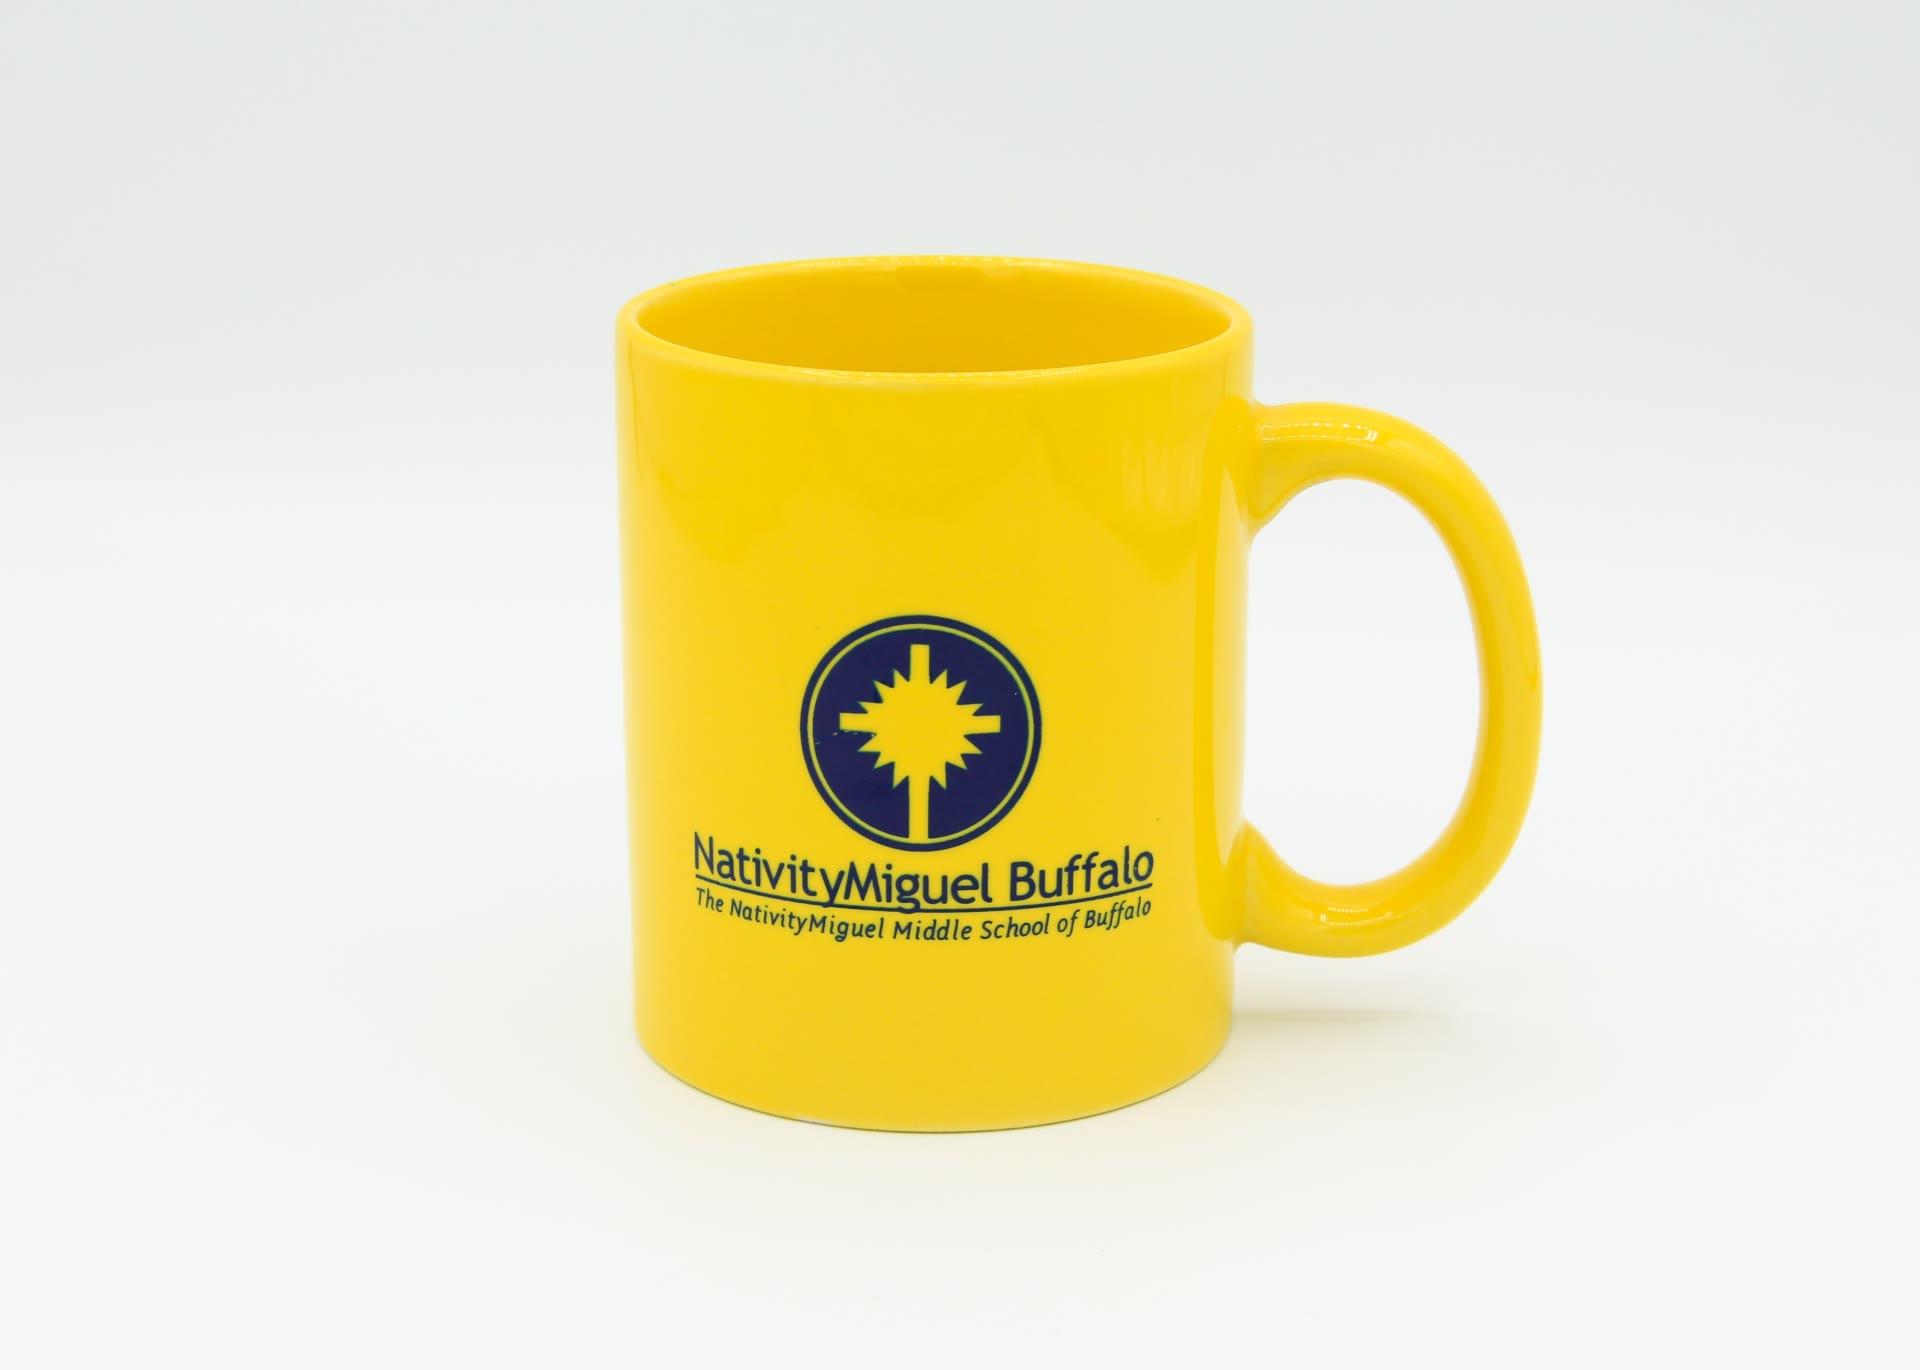 Nativity Miguel Middle School mug